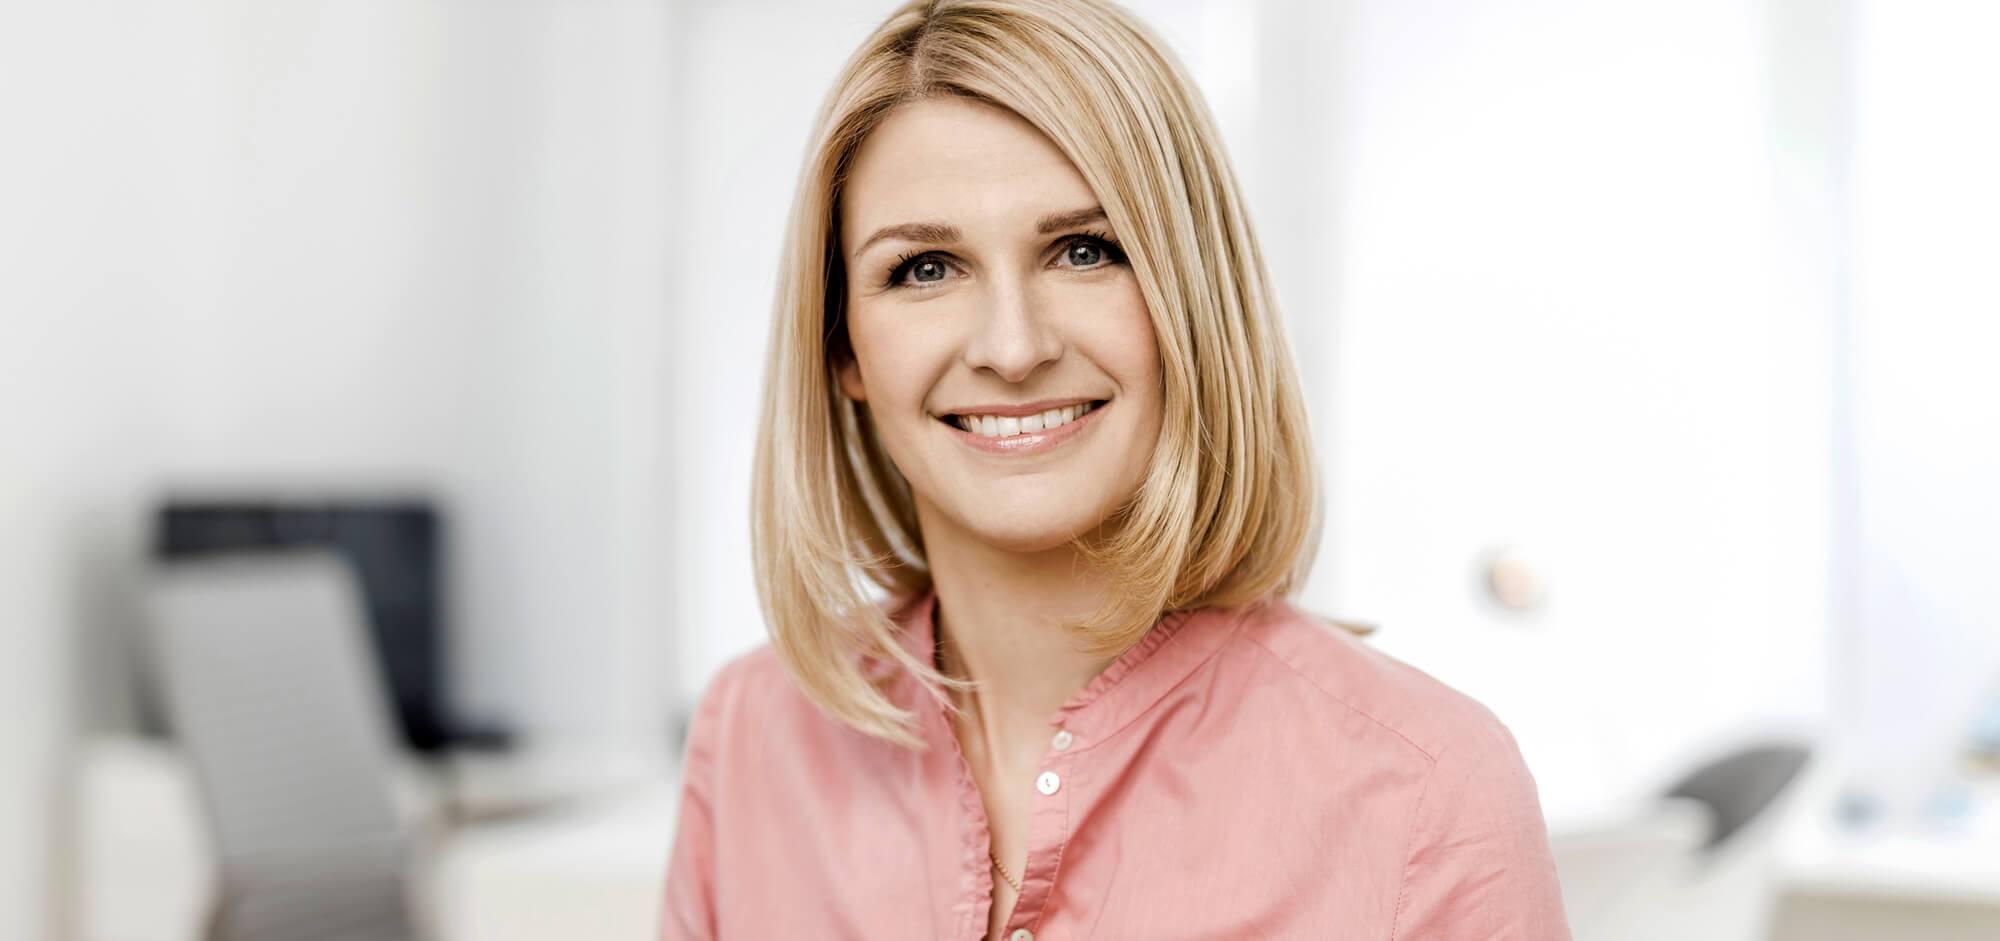 Frau Dr. Angelika Derksen, Neurologin aus Düsseldorf